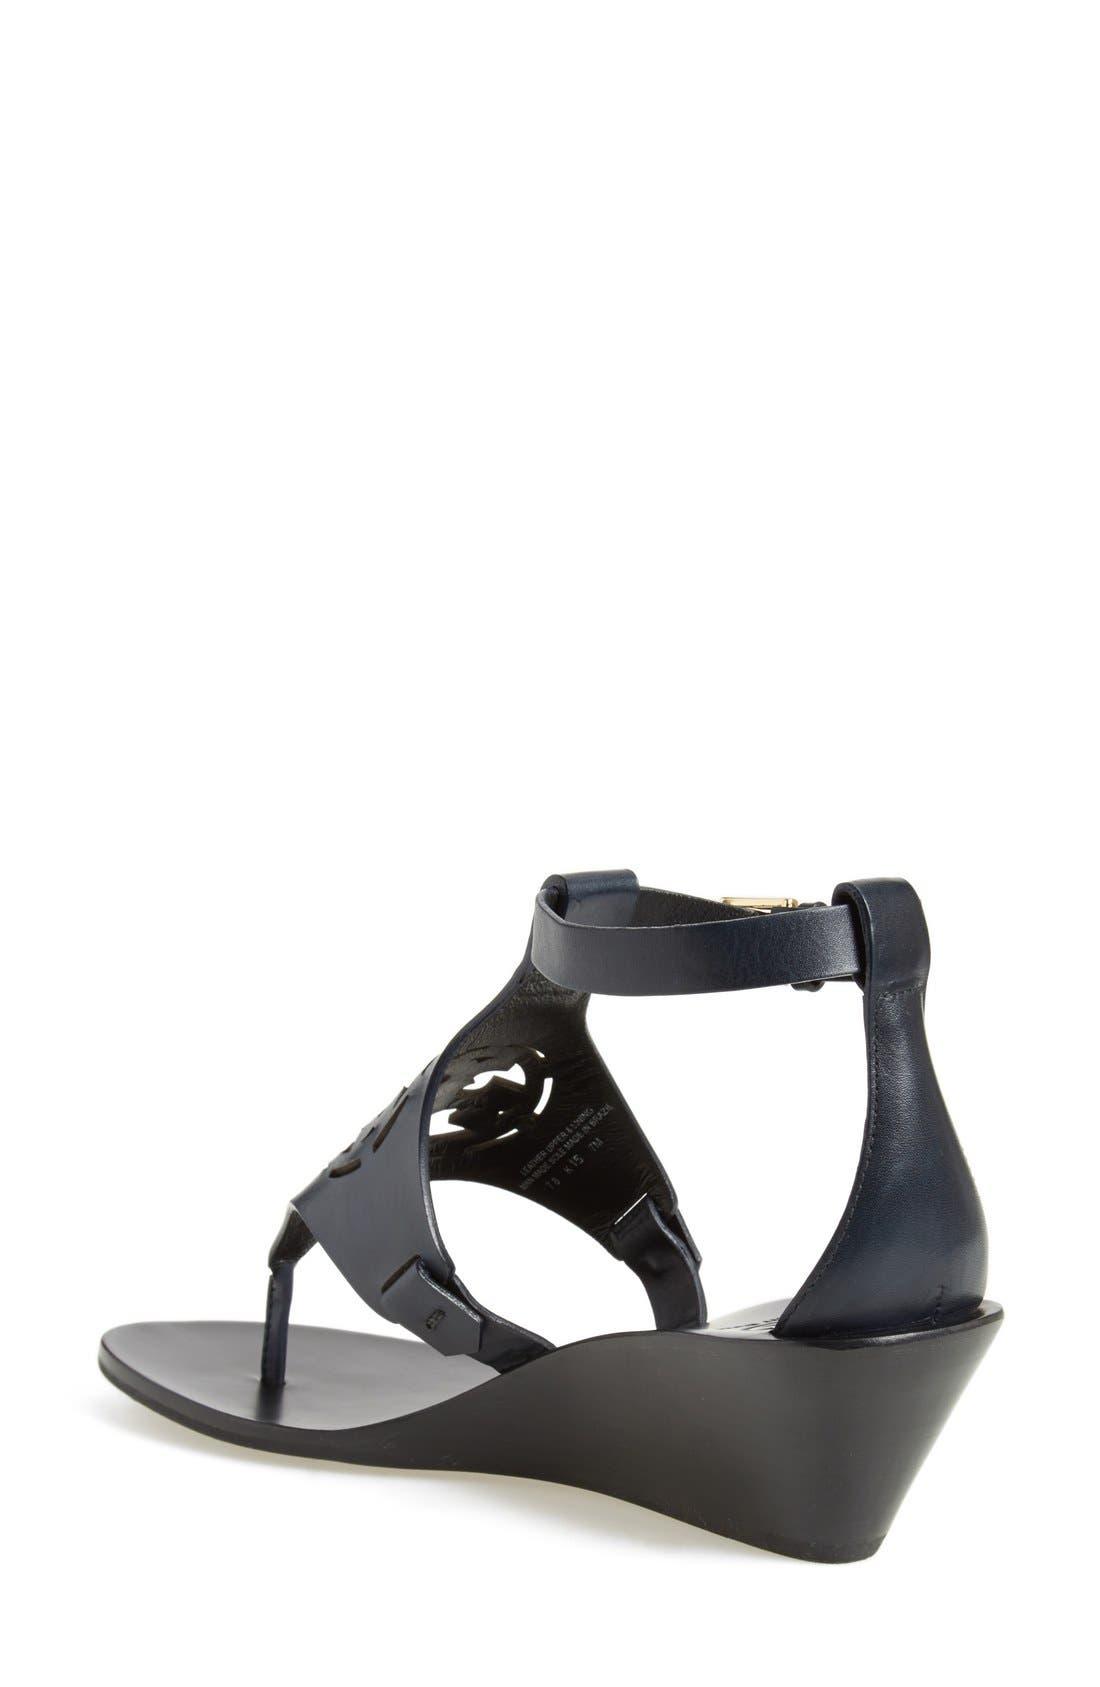 Alternate Image 2  - Tory Burch 'Zoey' Wedge Sandal (Women)